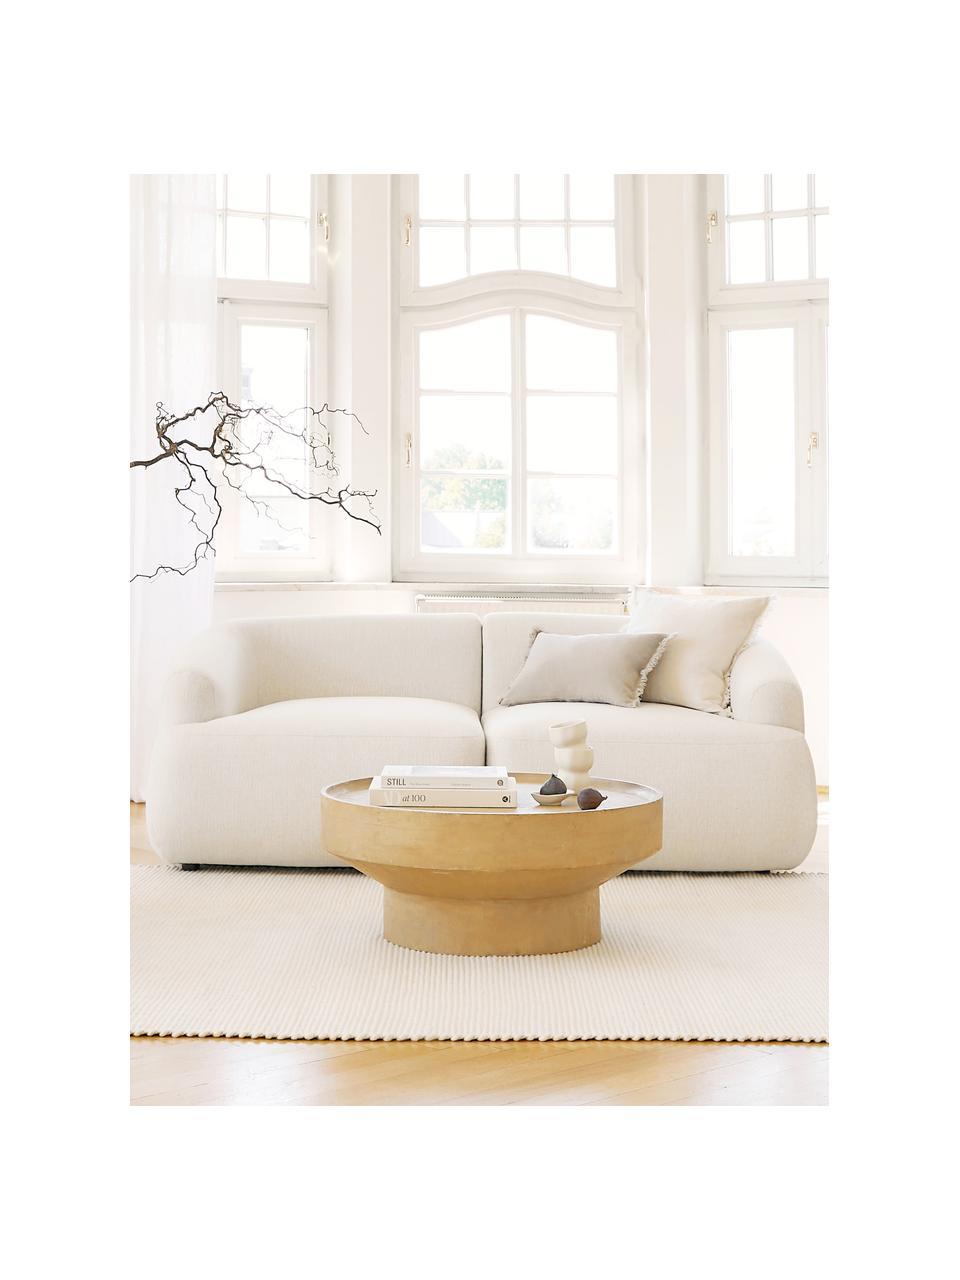 Modulares Sofa Sofia (2-Sitzer) in Beige, Bezug: 100% Polypropylen Der hoc, Gestell: Massives Kiefernholz, Spa, Füße: Kunststoff, Webstoff Beige, B 192 x T 95 cm